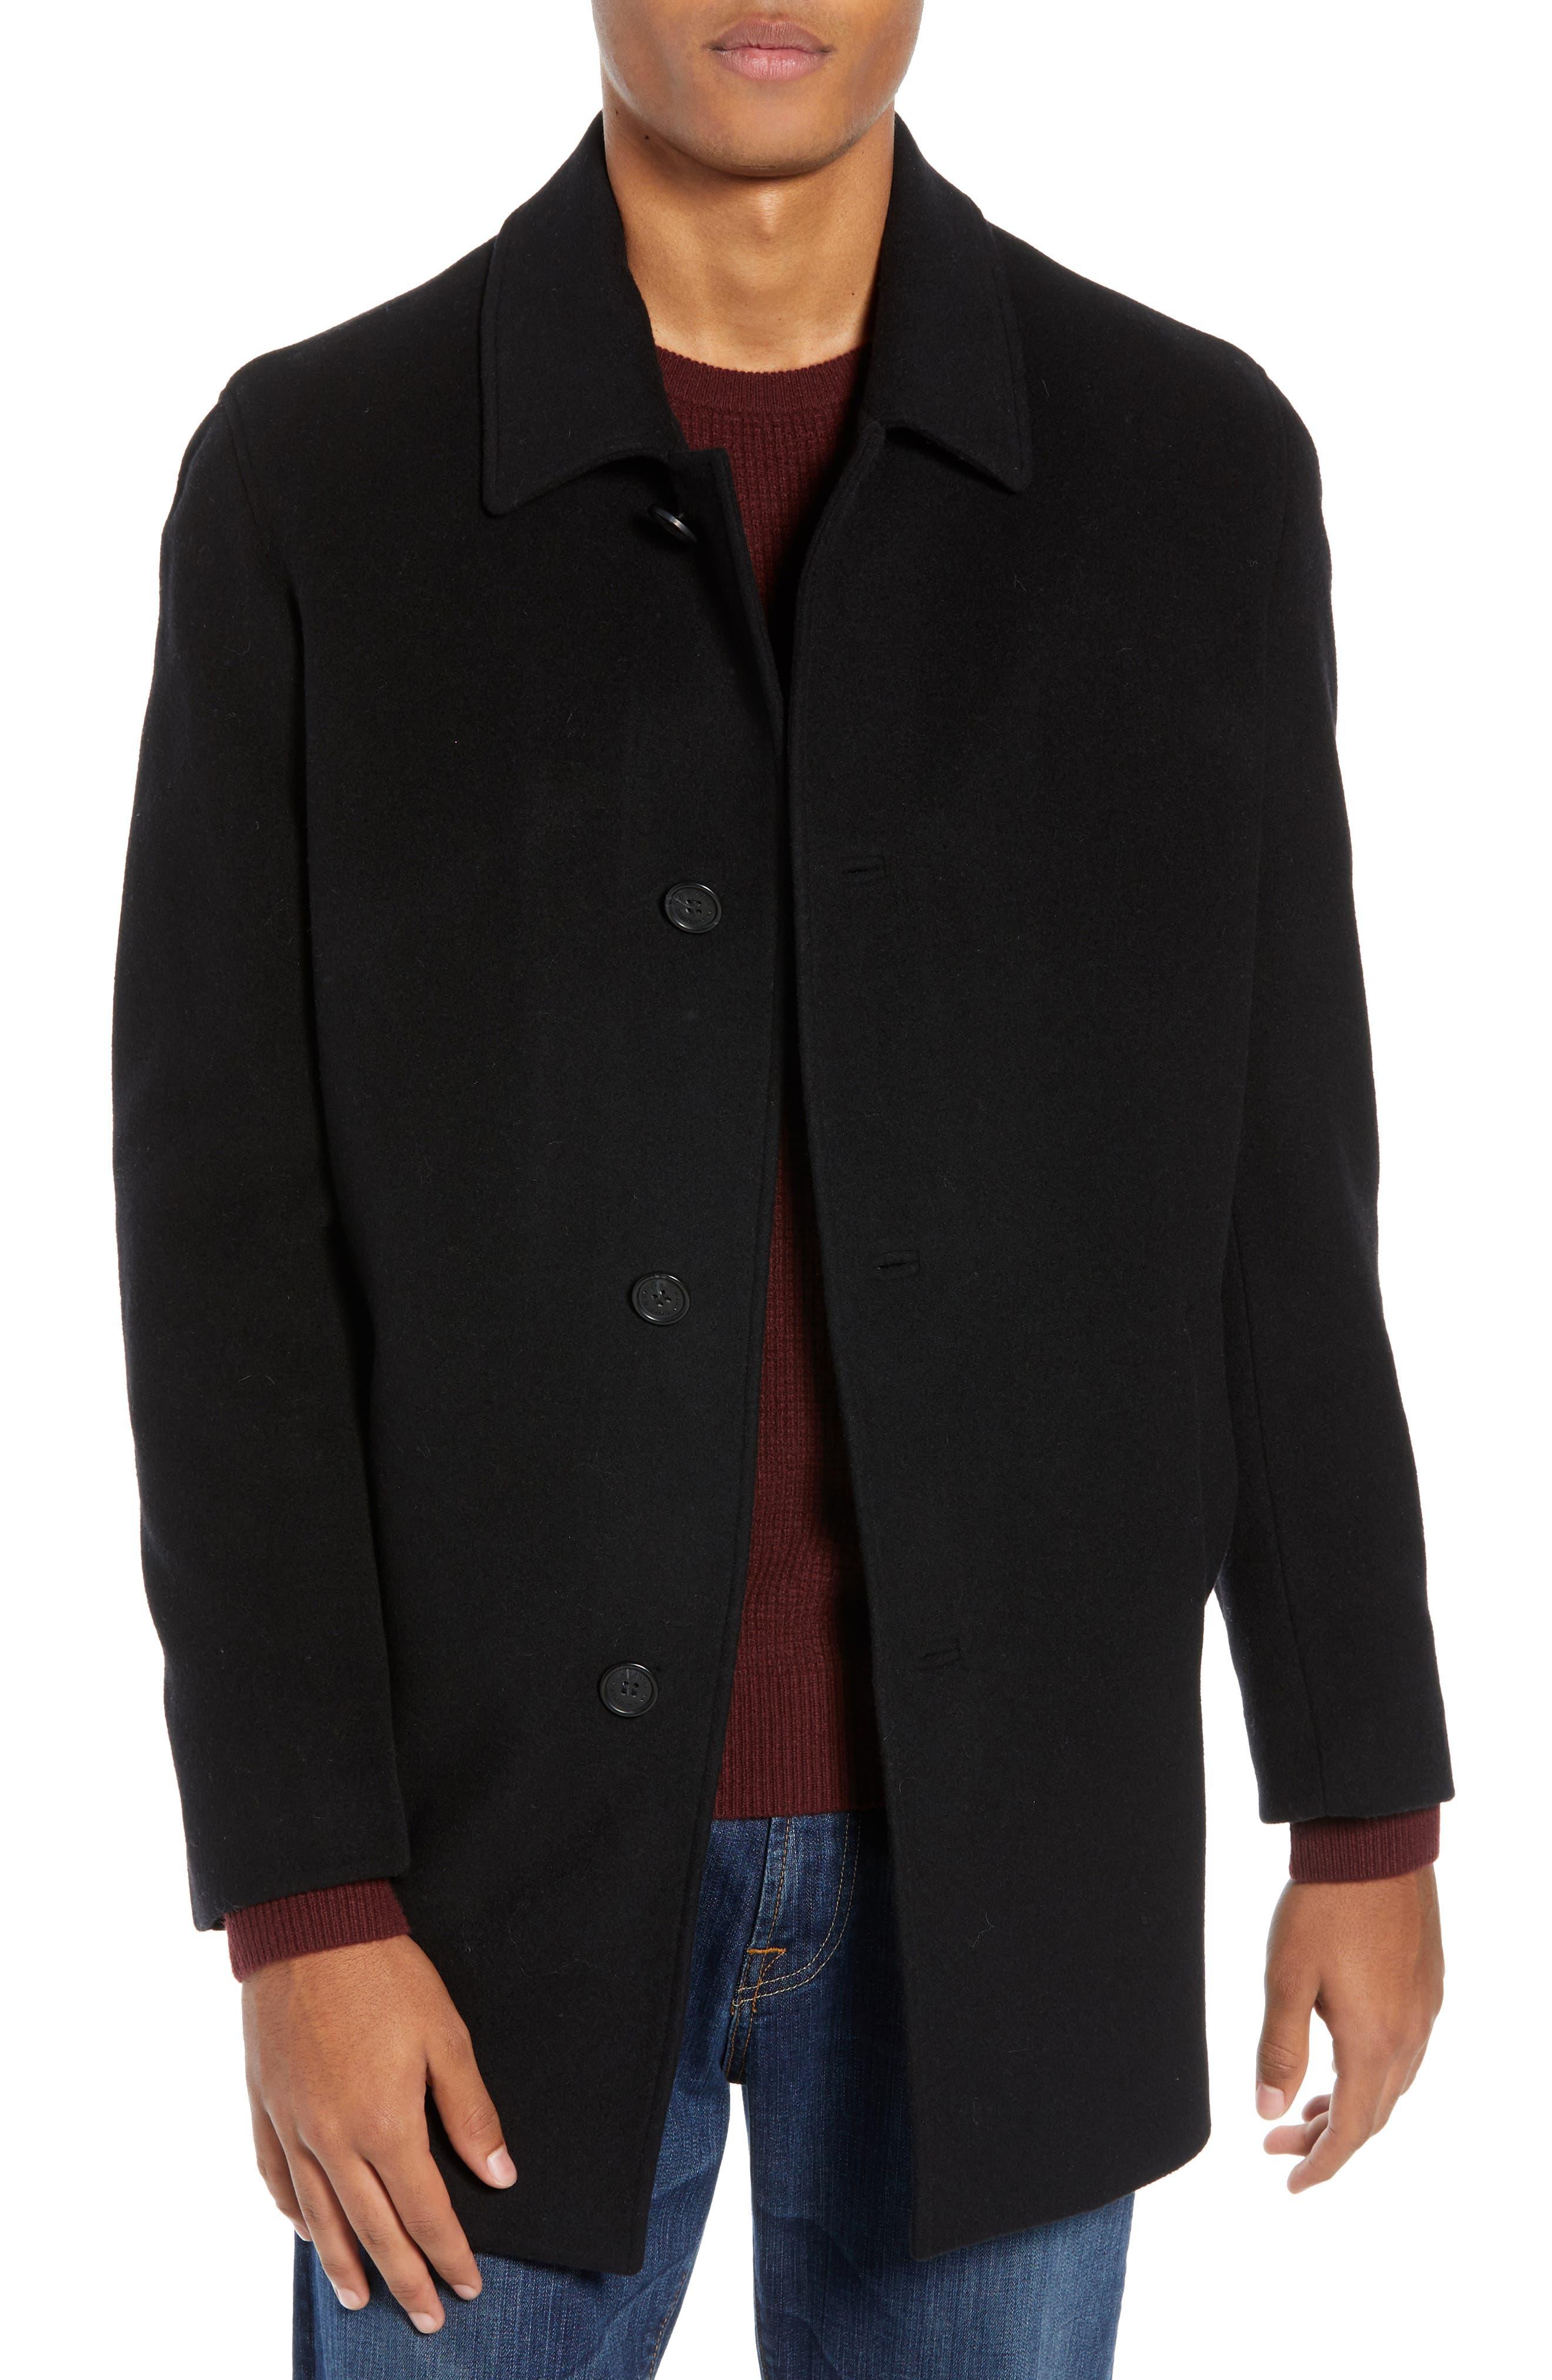 COLE HAAN, Italian Wool Blend Overcoat, Main thumbnail 1, color, 001